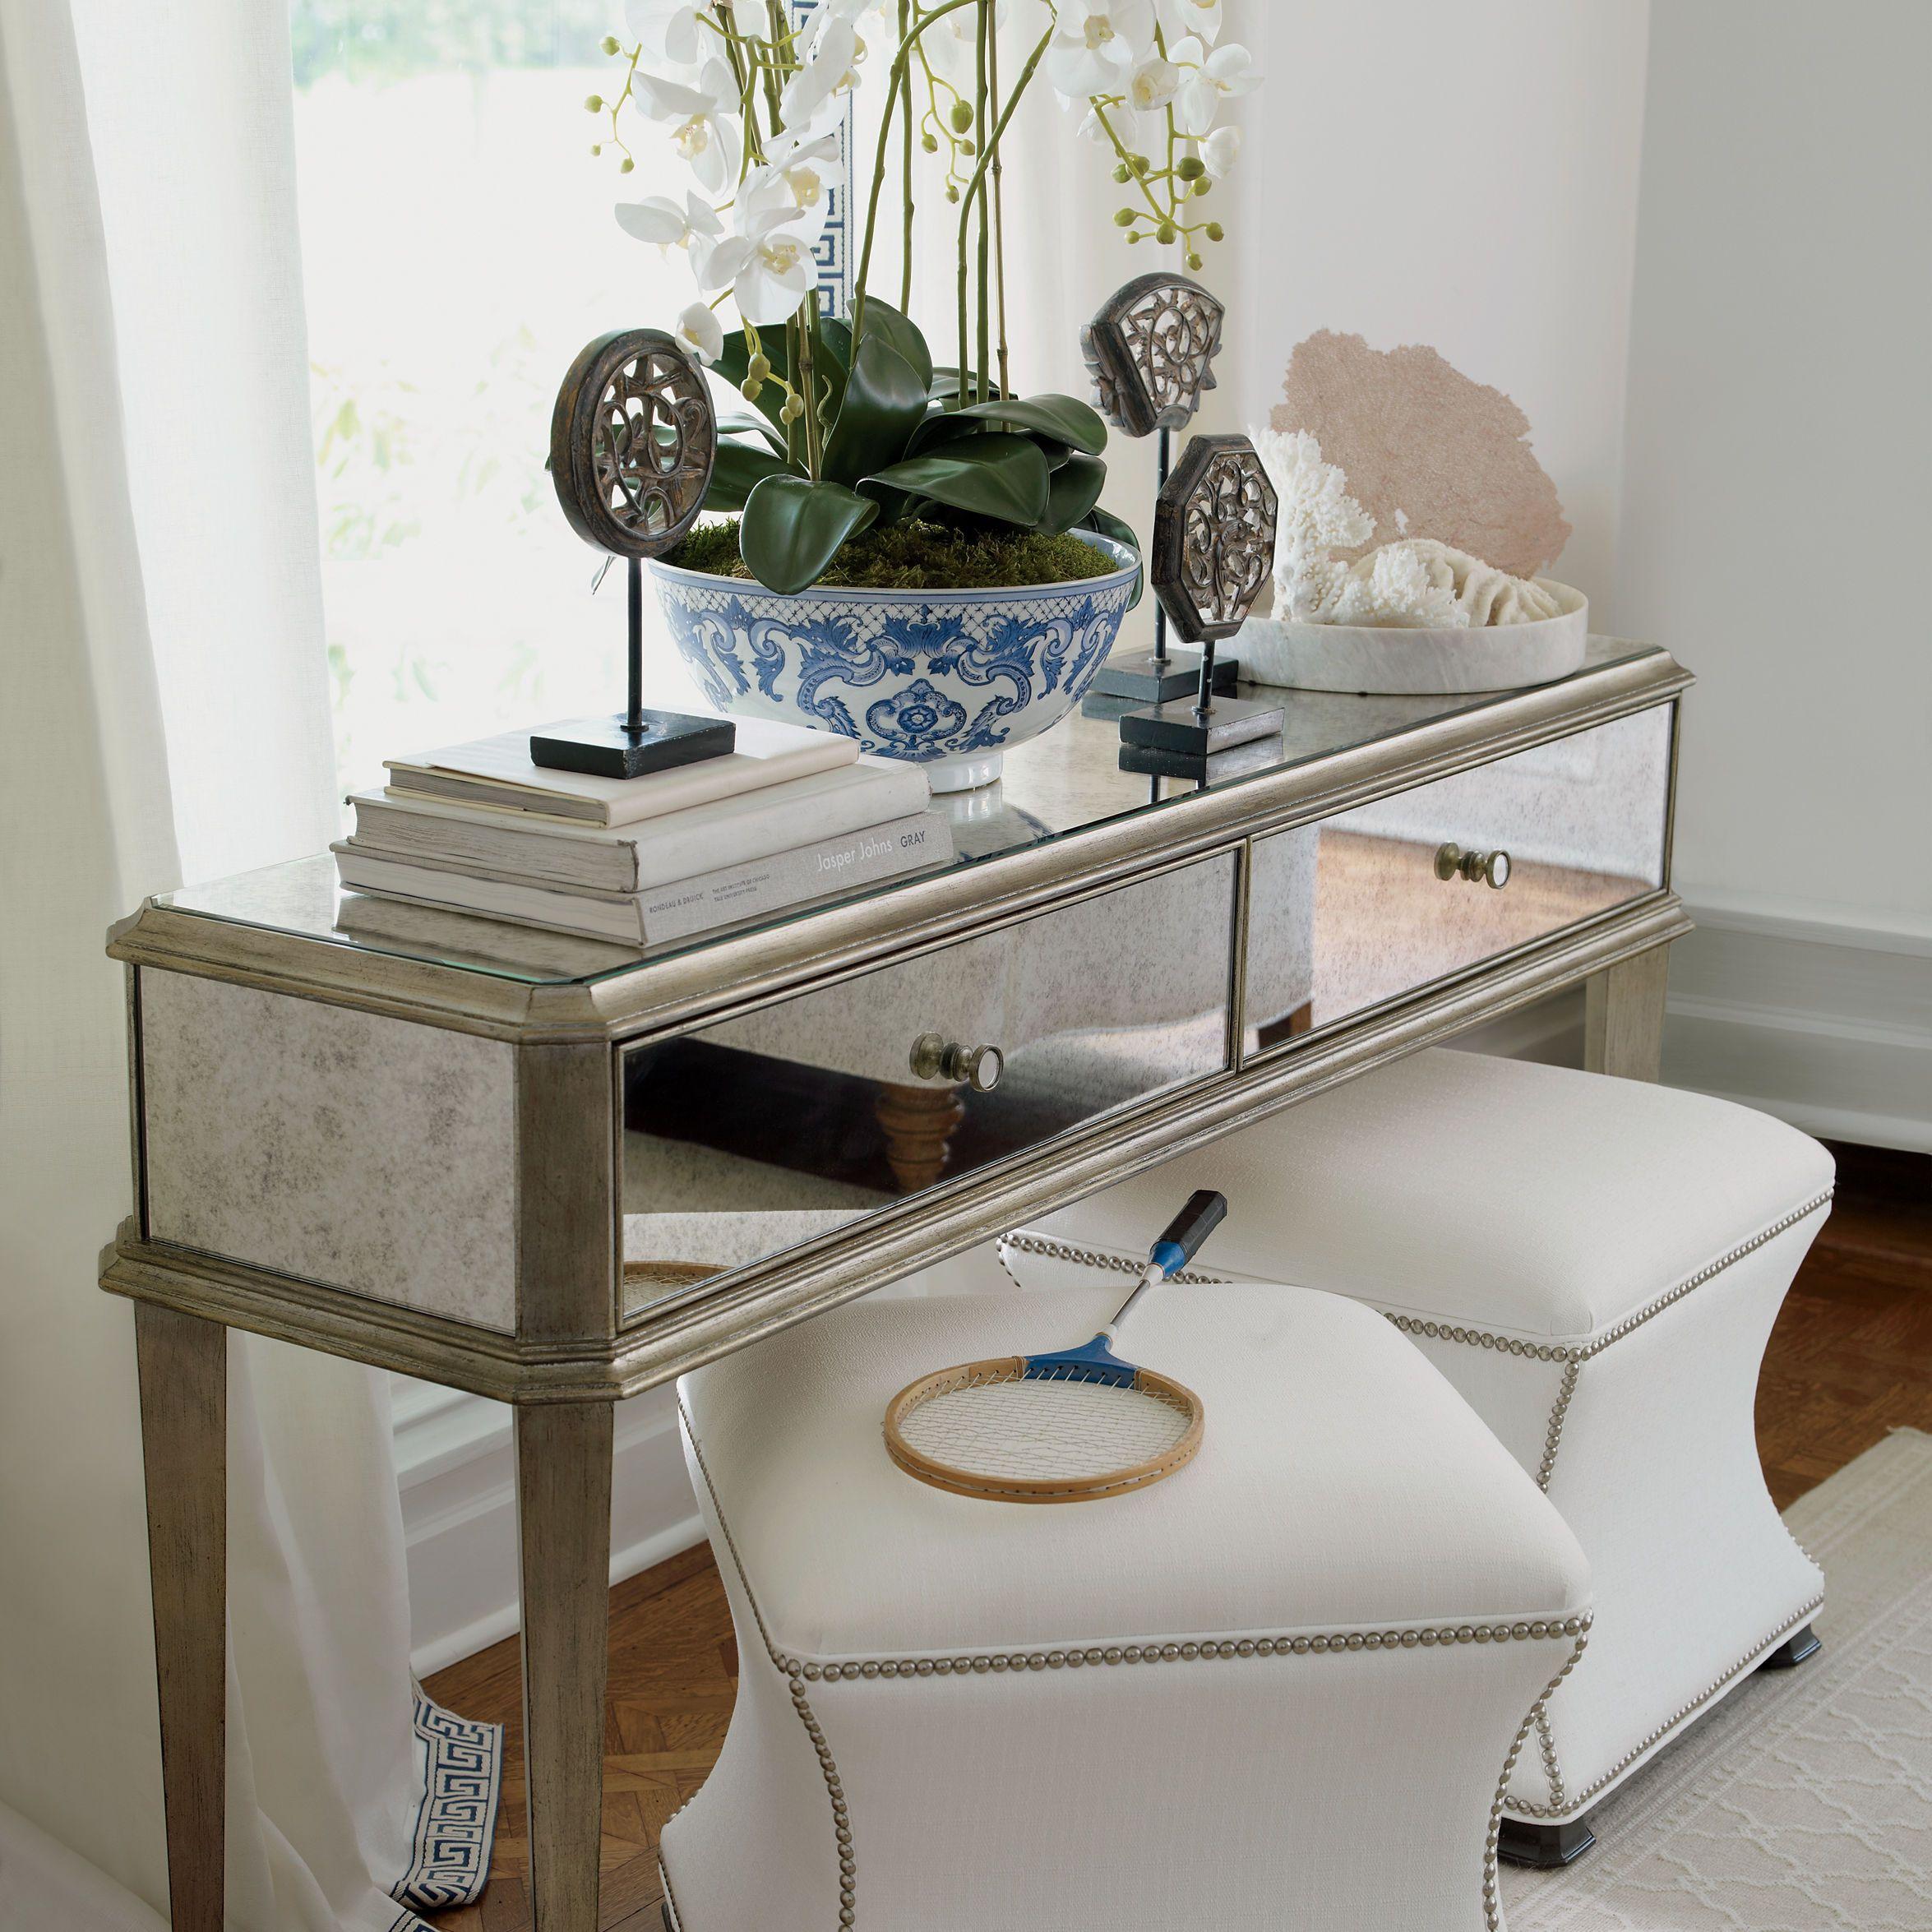 Vivica Sofa Table Home Decor Living Room Console Furniture